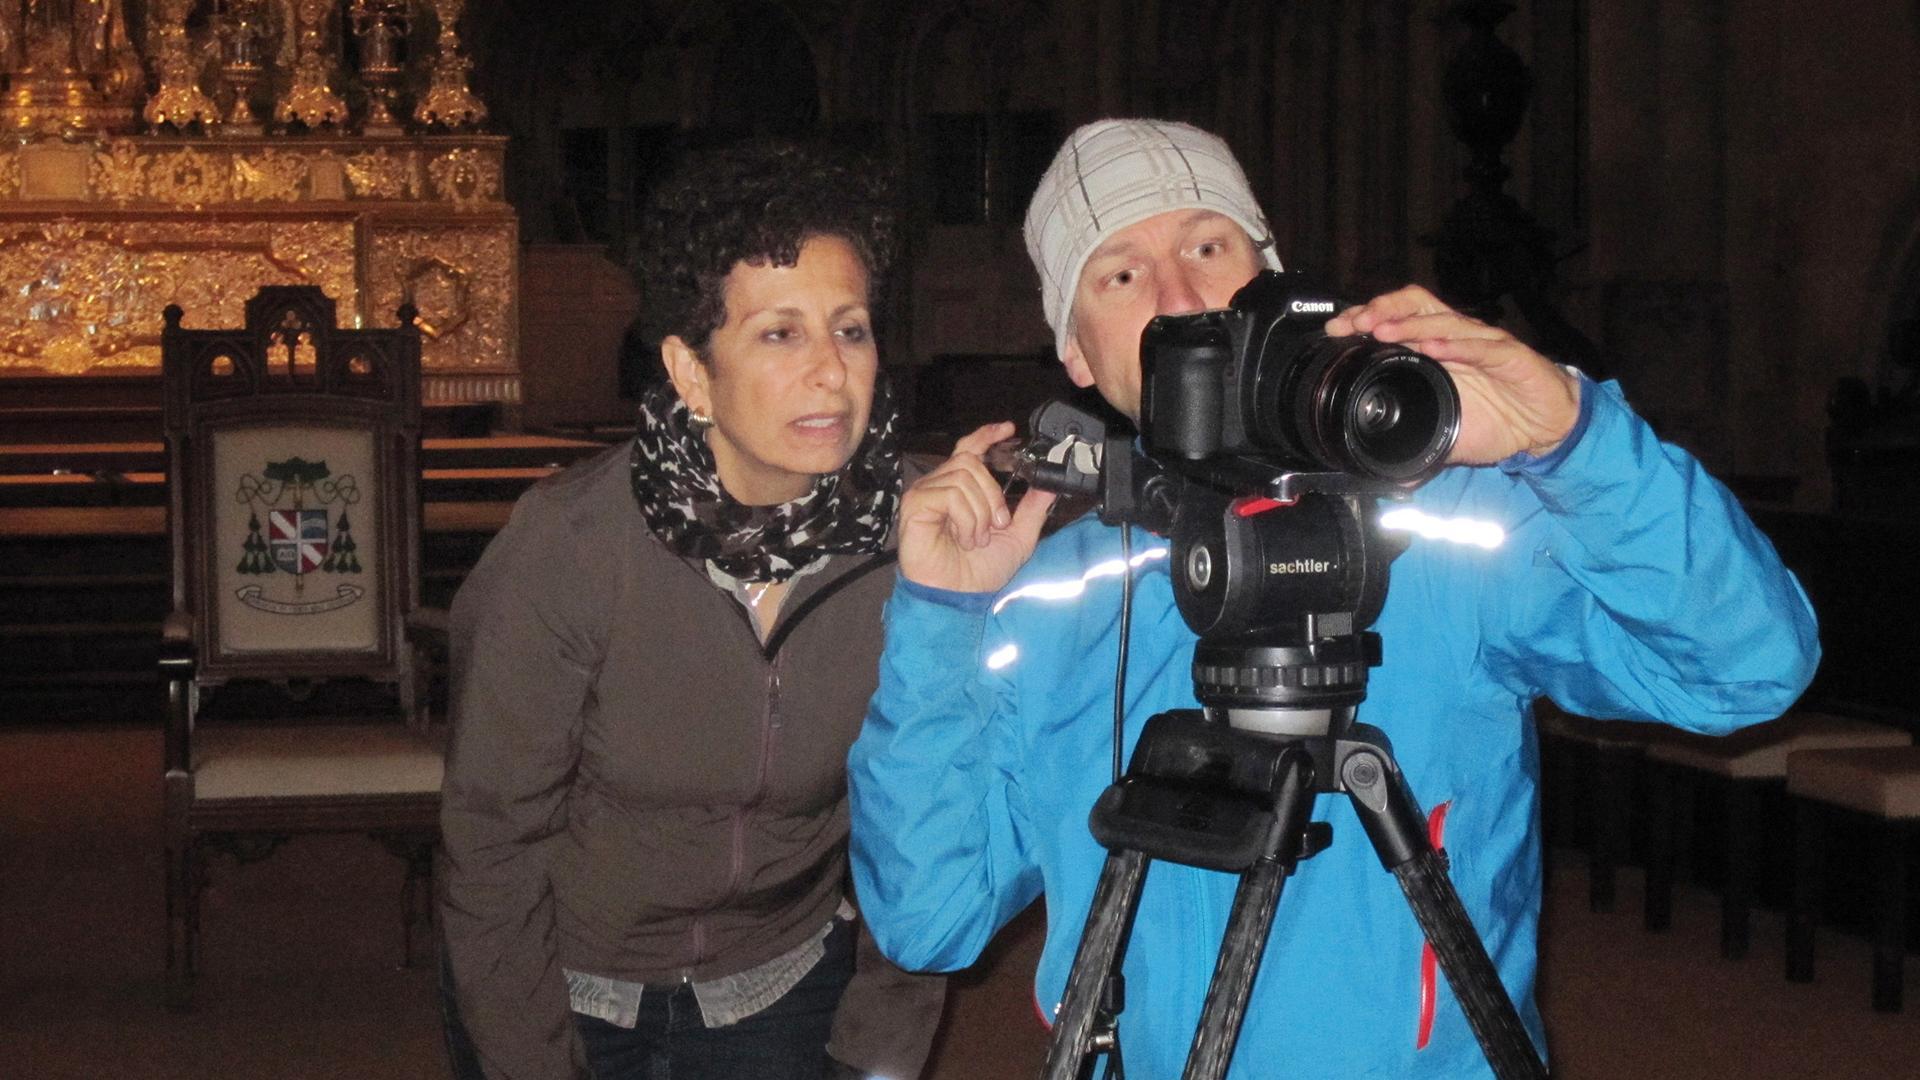 Filmemacherin Mona Botros und Kameramann Andreas Kerle nahmen sich des Themas an. Foto: SWR/ Mona Botros